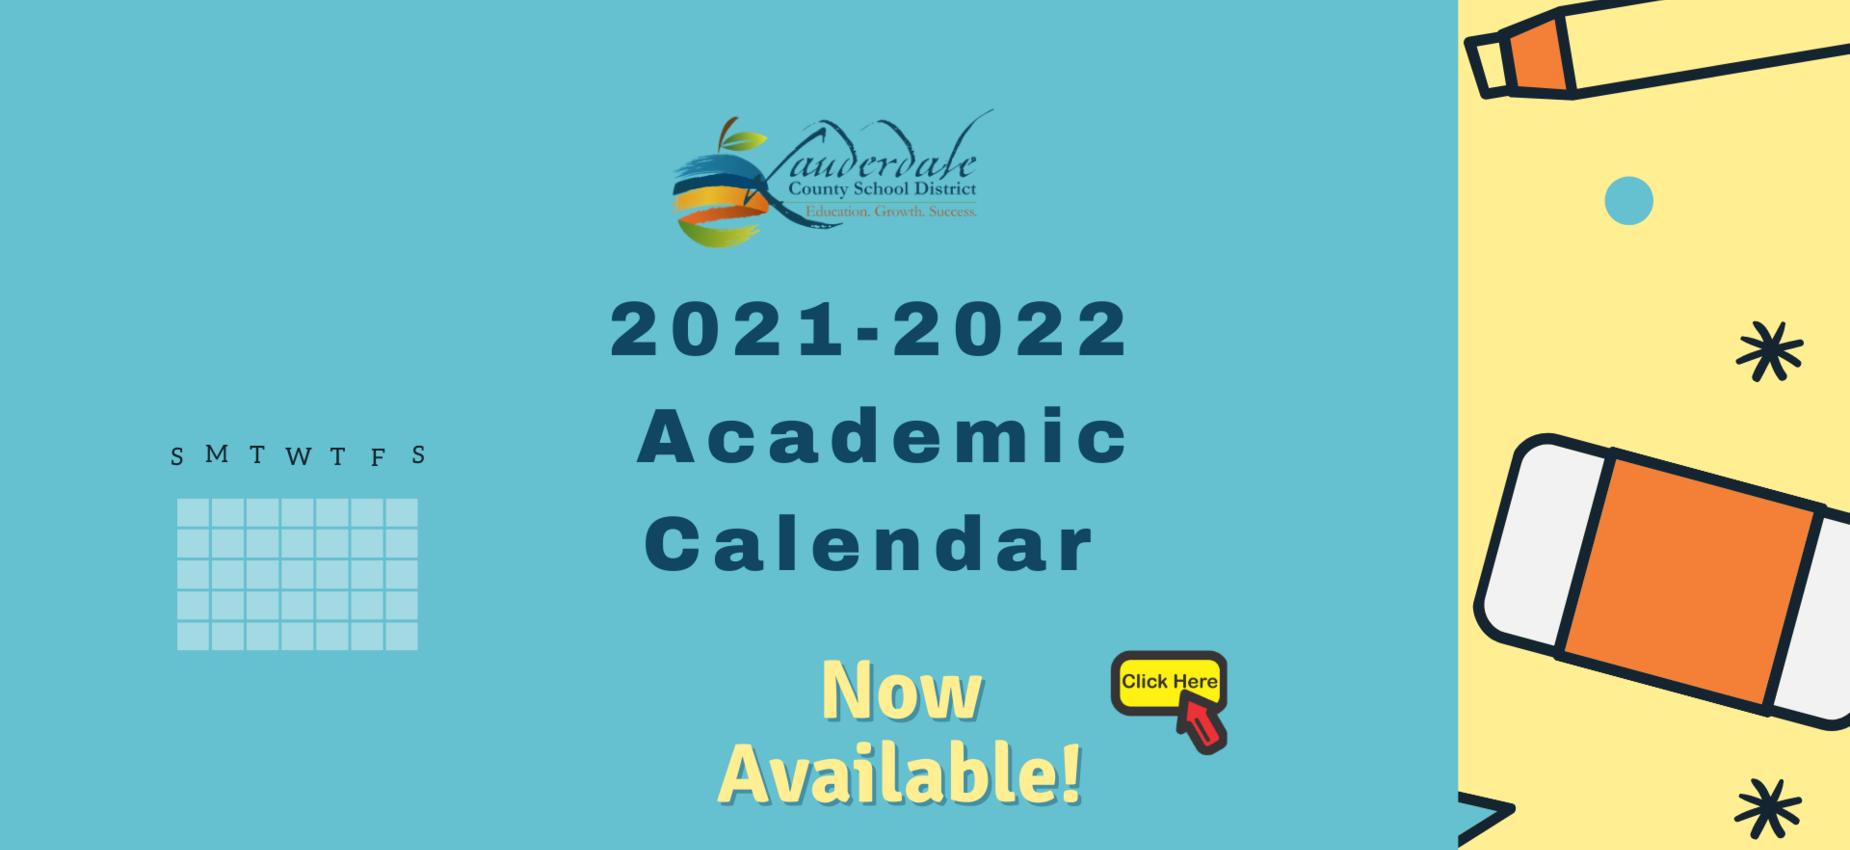 LCSD 2021-2022 Academic Calendar Graphic